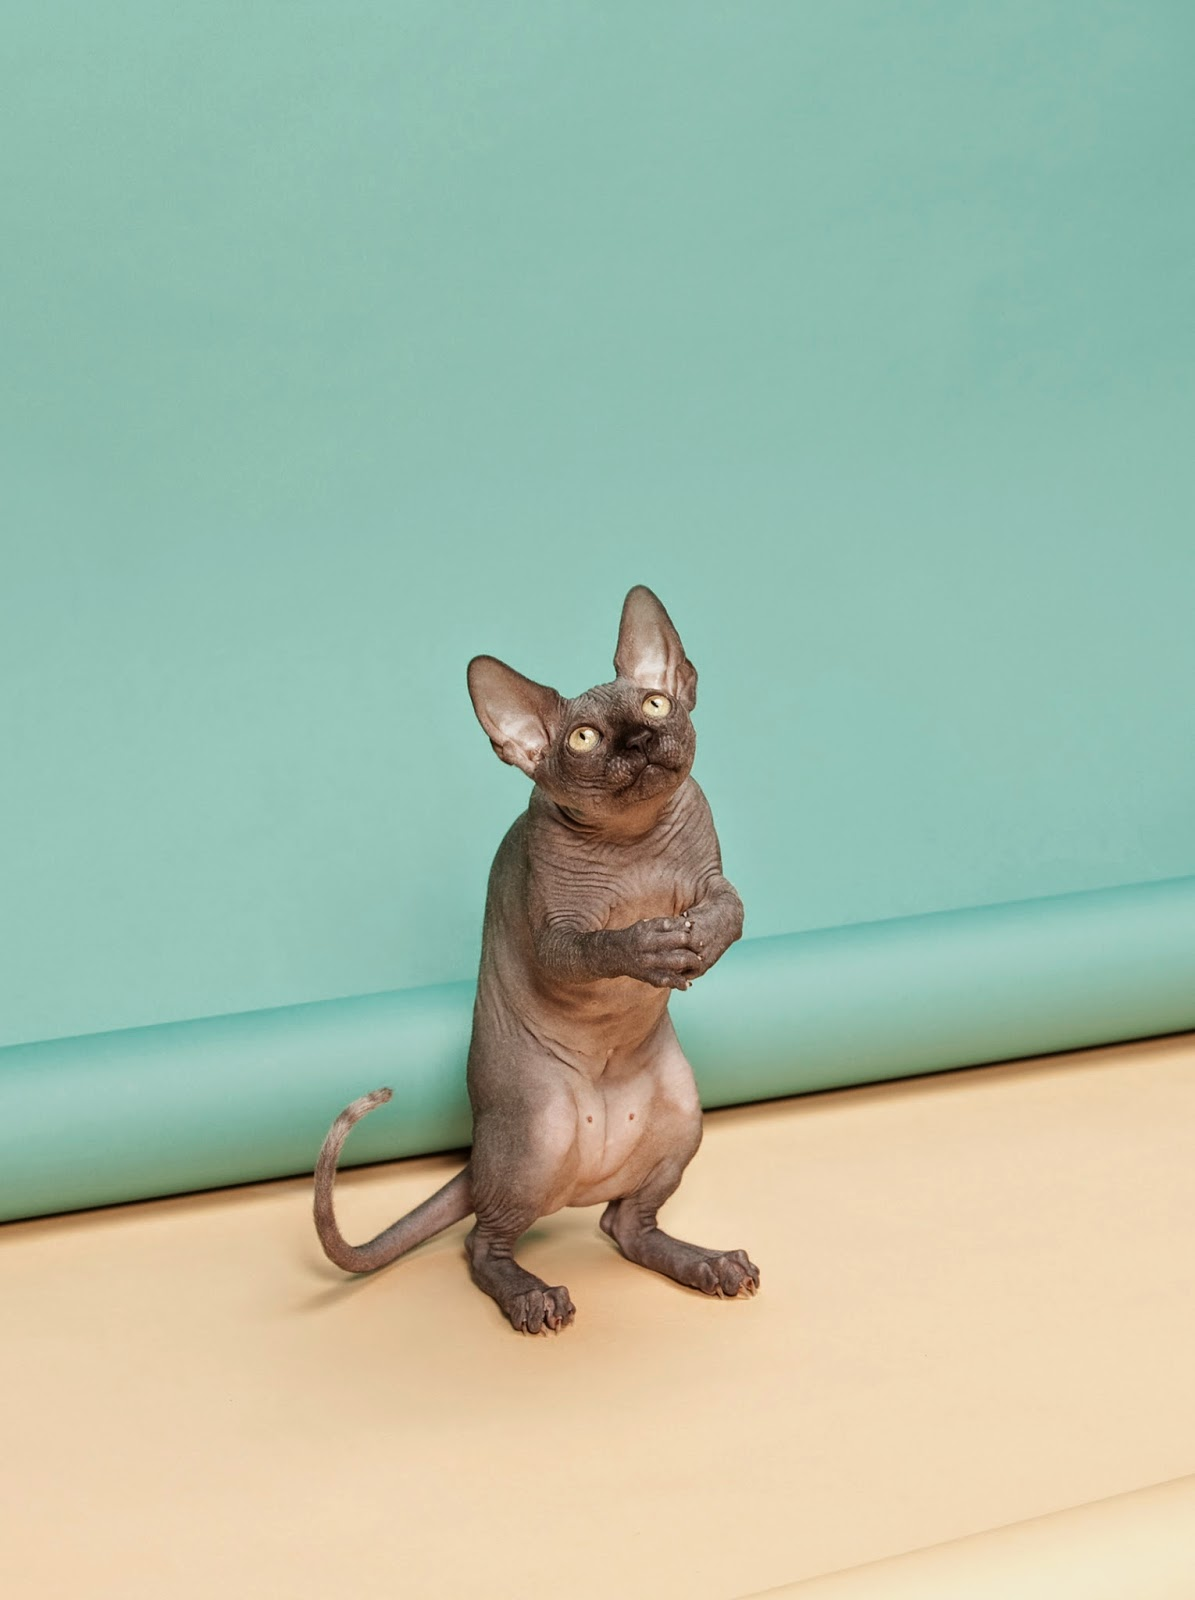 Copyright: (c) Kimmo Metsaranta, Finland, Shortlist, Still Life, Professional Competition, 2015 Sony World Photography Awards. Series Name: Animal Behaviour